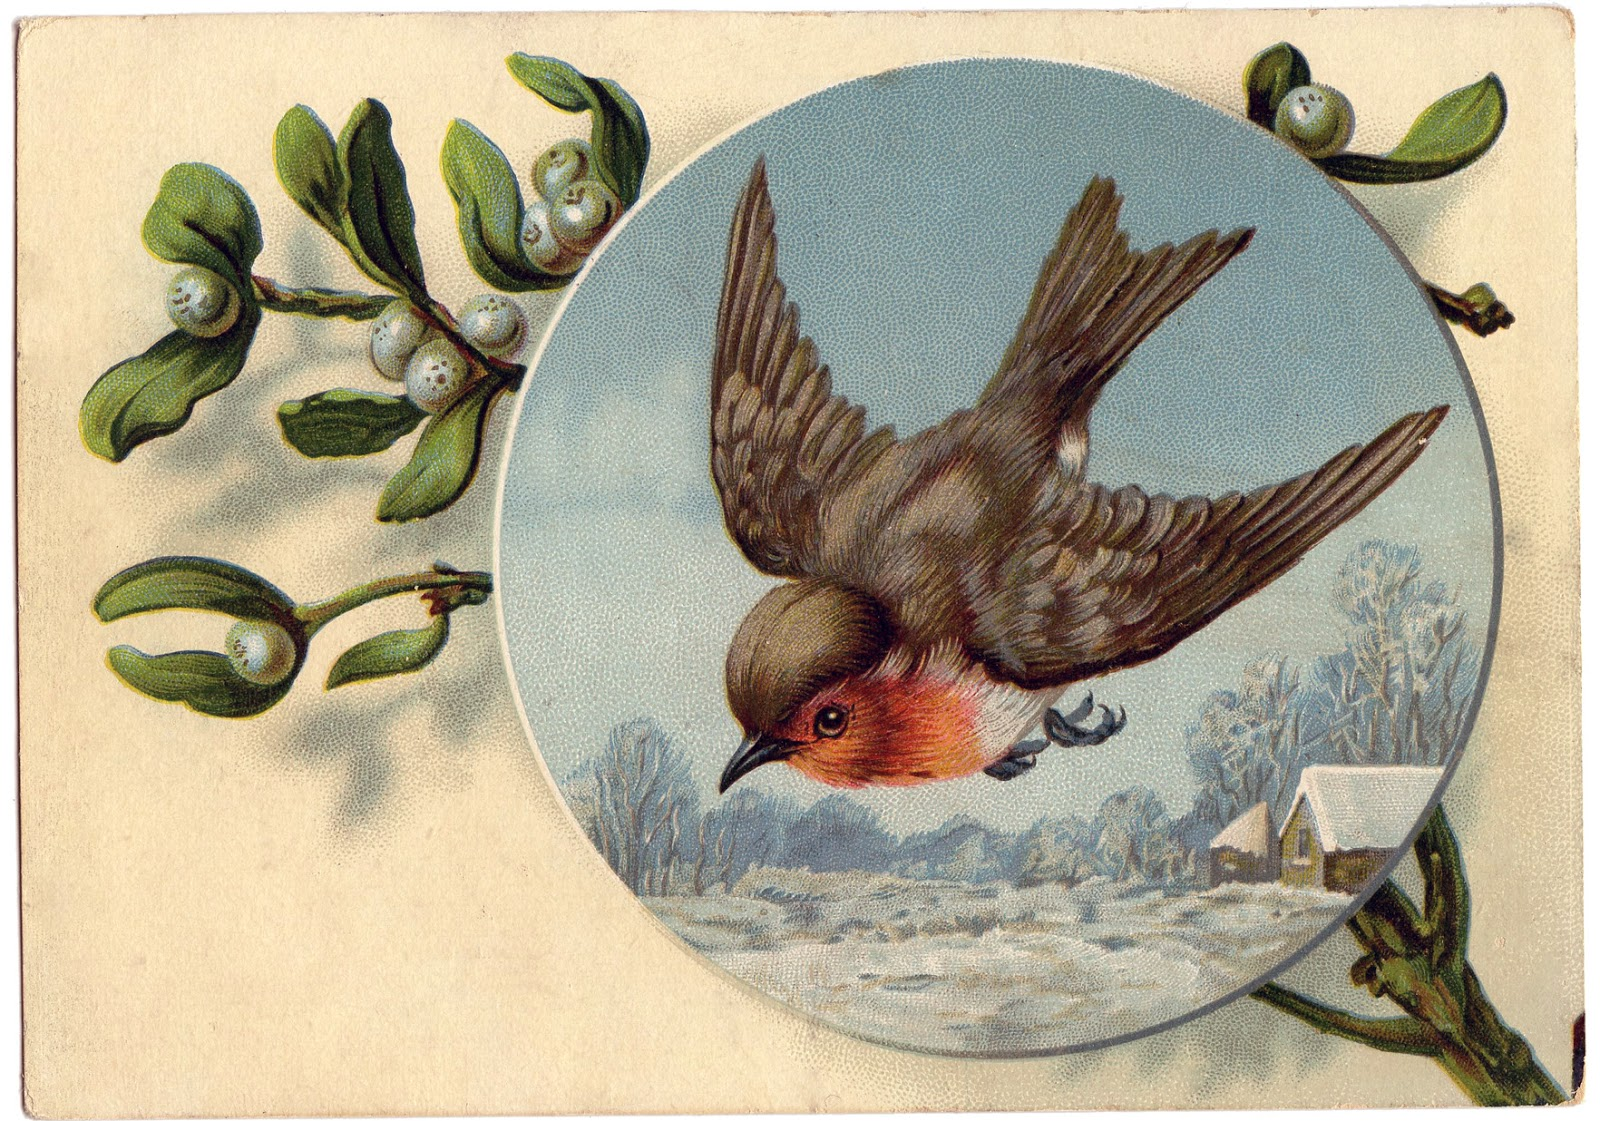 Winter bird images - photo#55